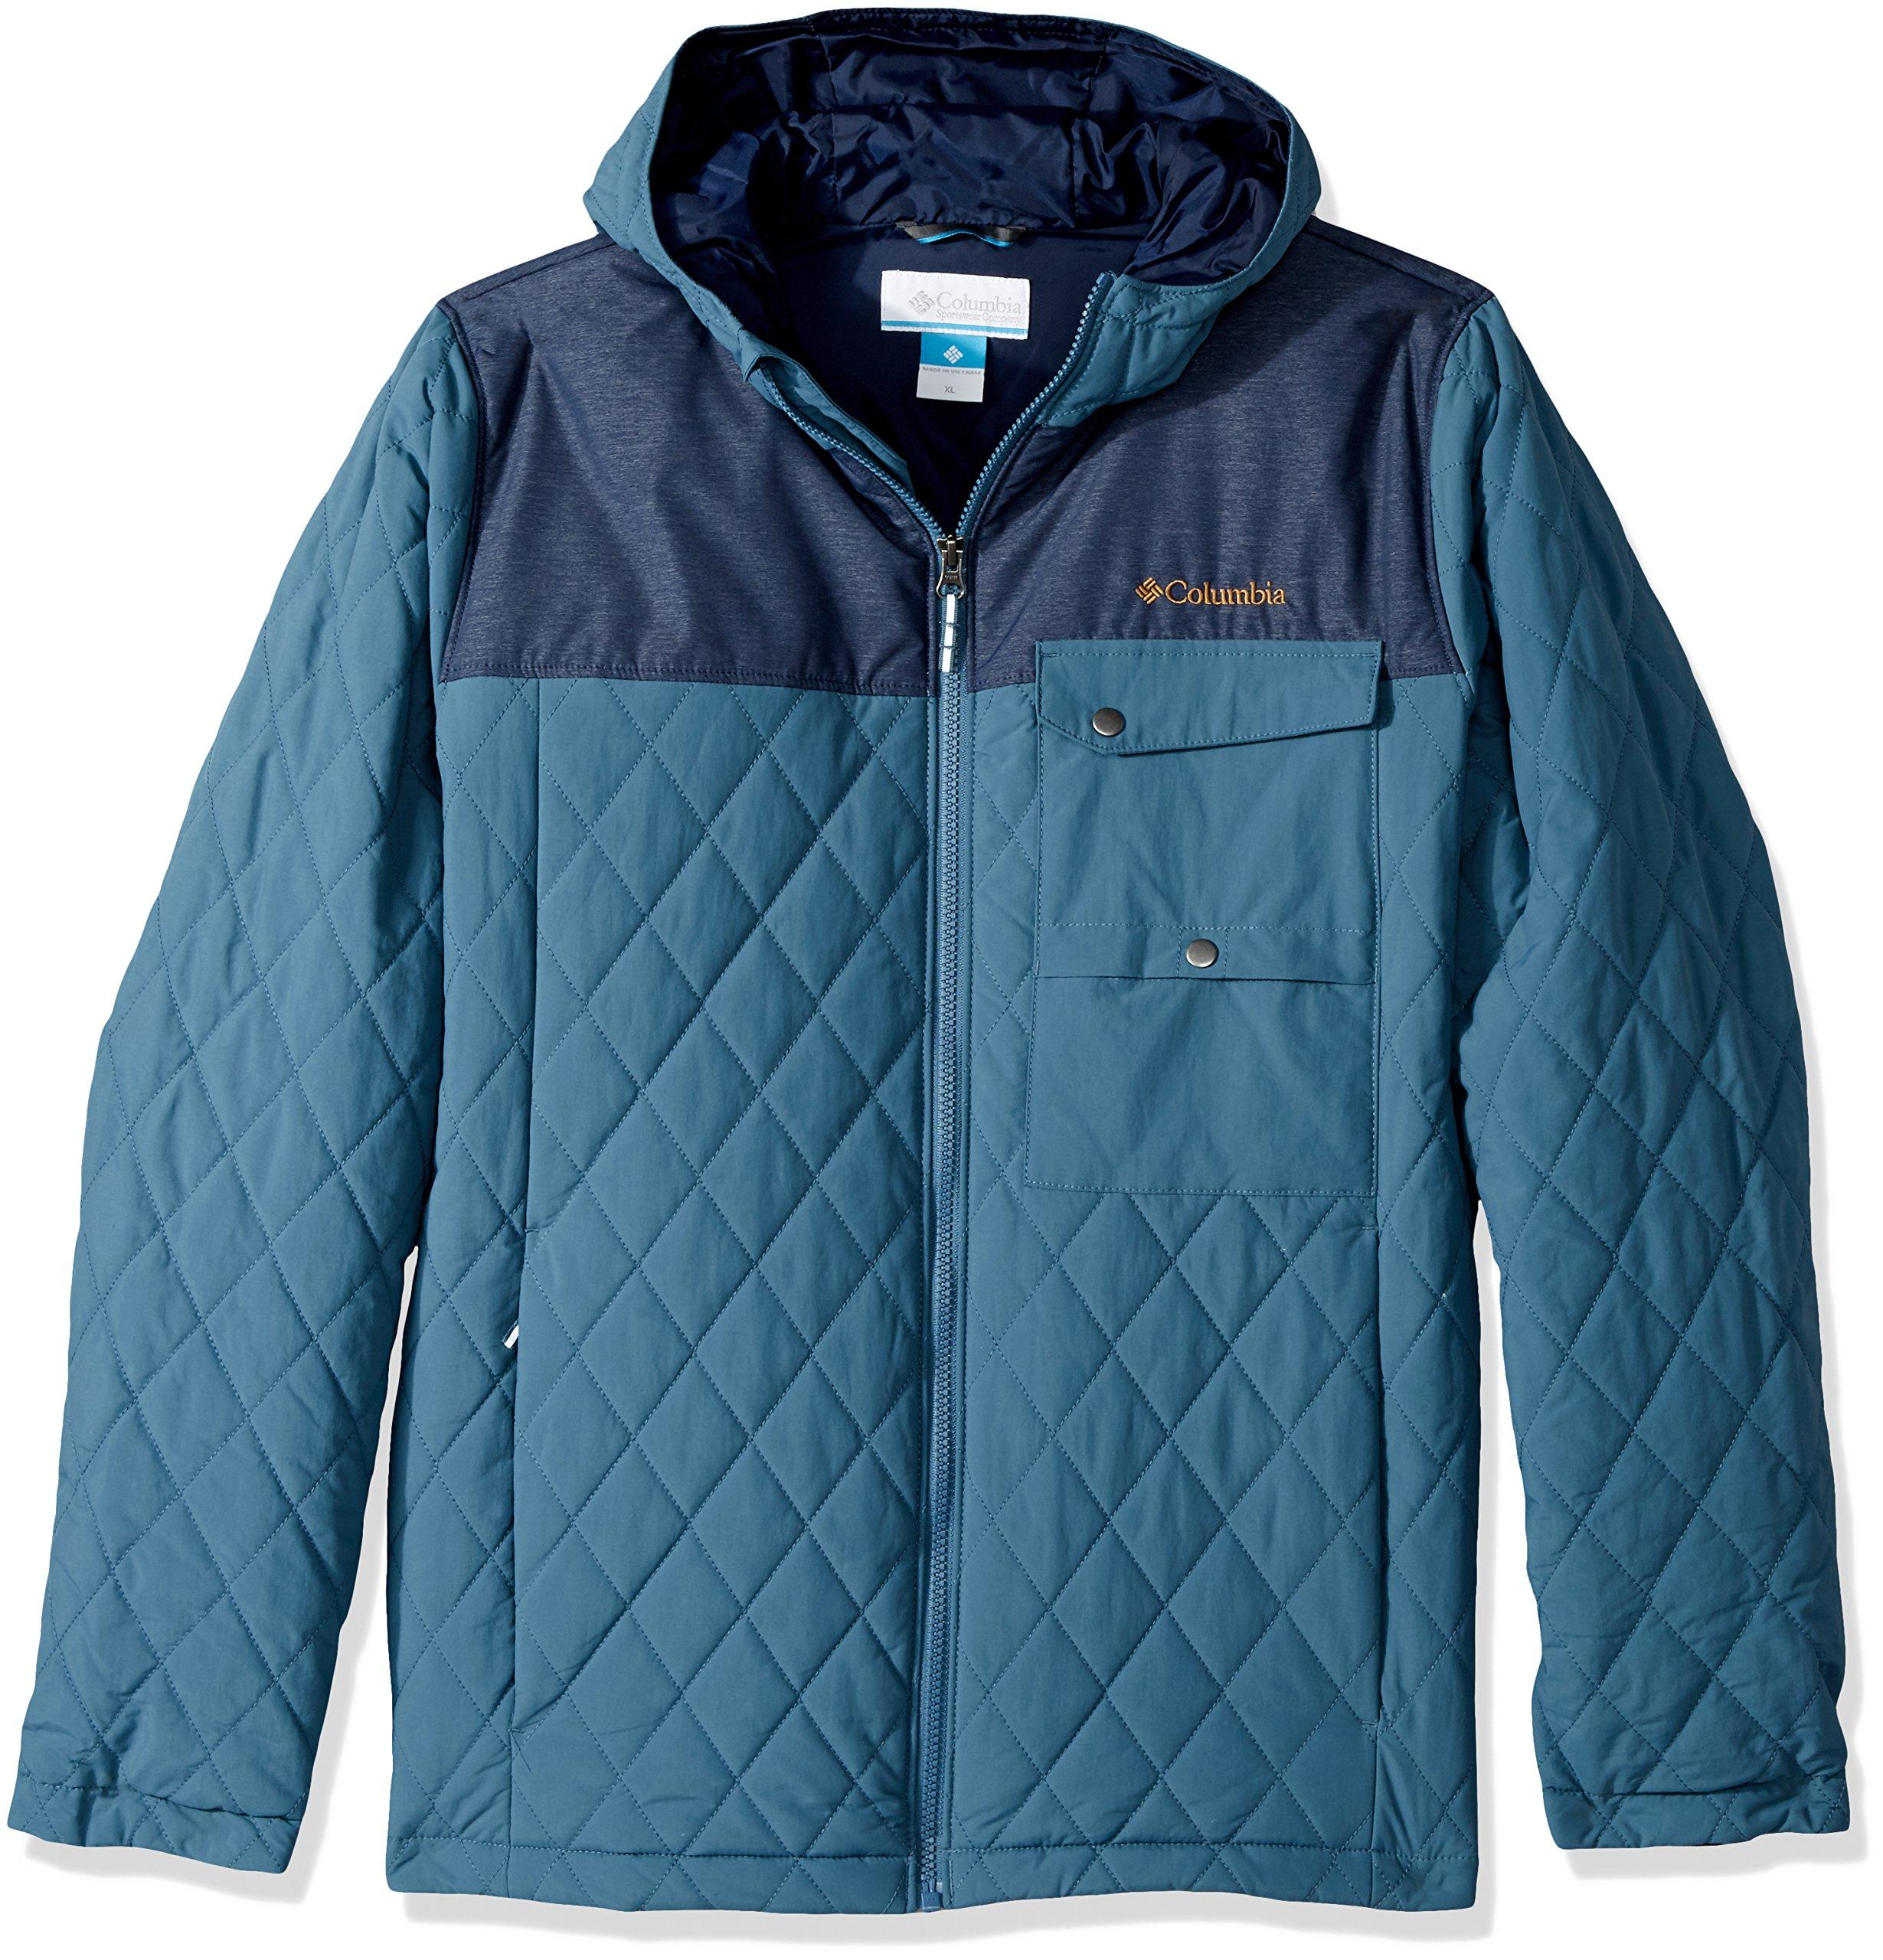 Columbia Boys' Big' Lookout Cabin Jacket, Blue Heron, Coll Navy Heather, Medium